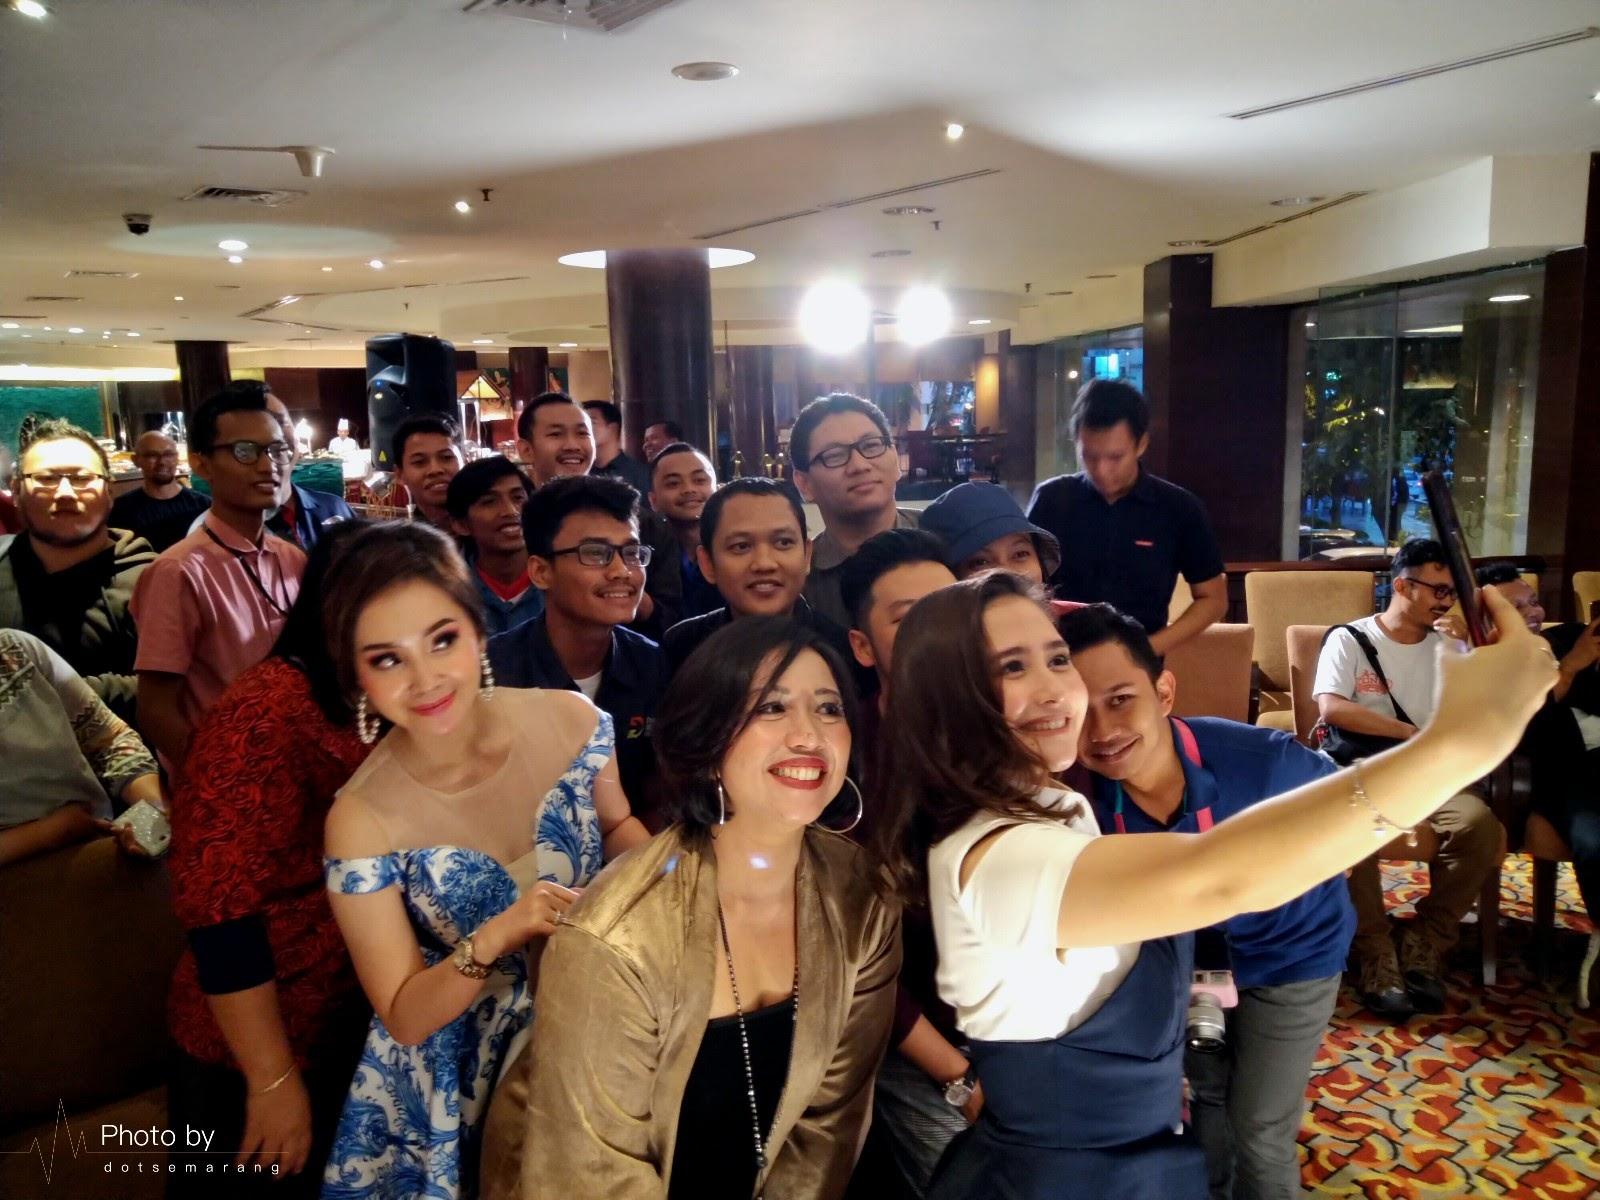 [#IGTV] Lebih Dekat Dengan Prilly Latuconsia di Semarang